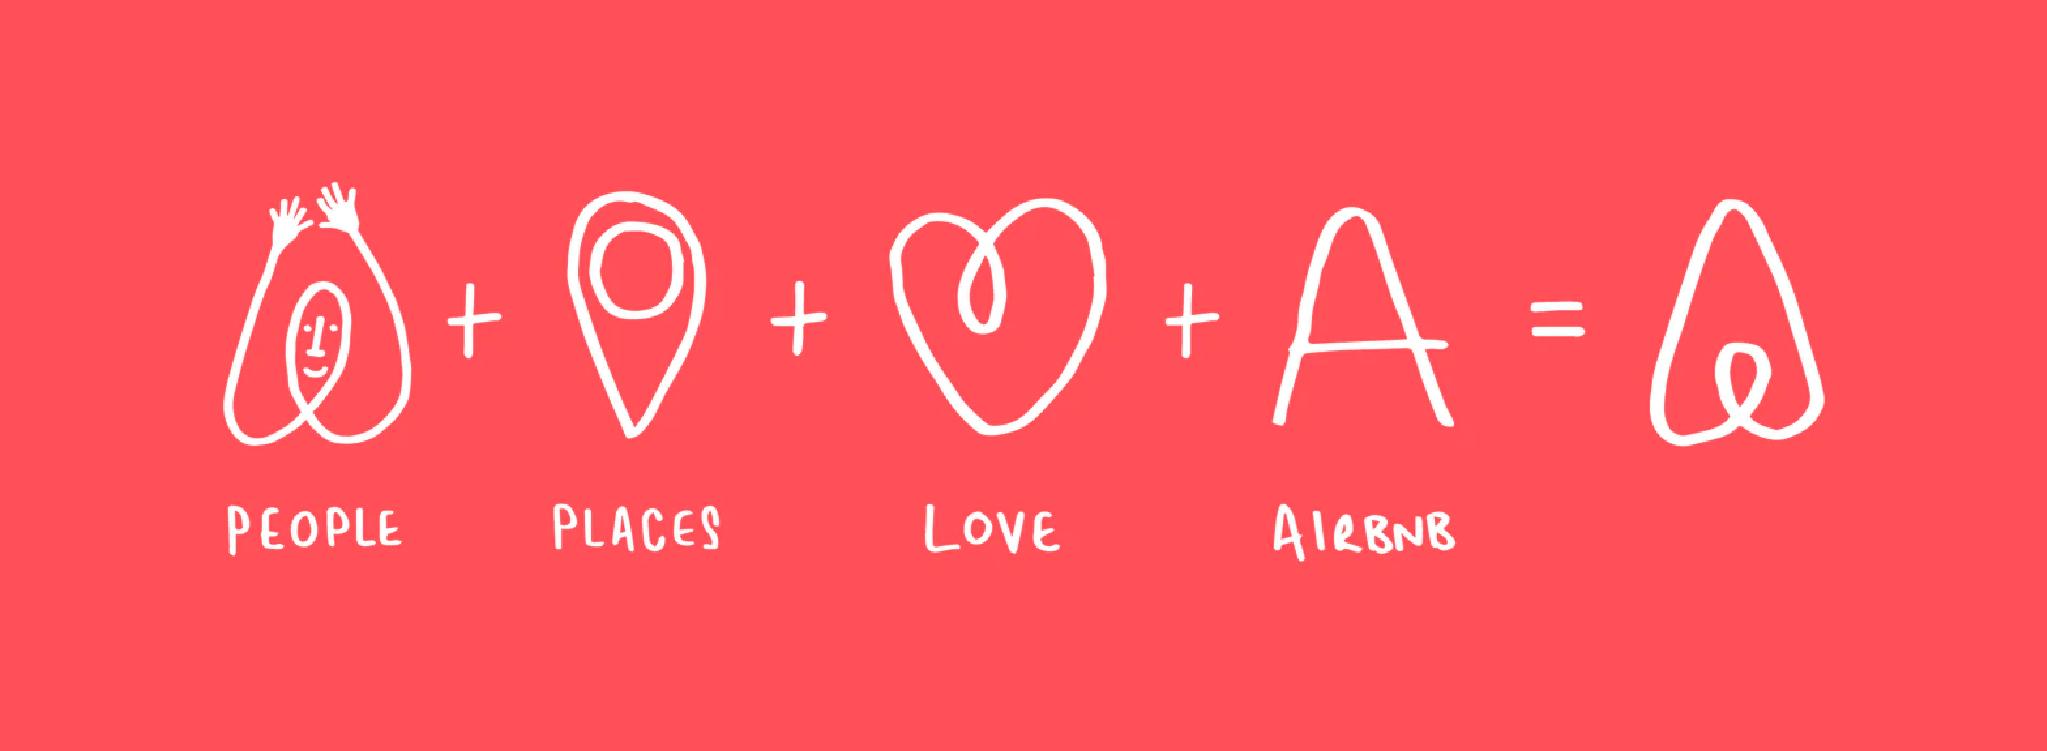 Elements of Airbnb rebranding logo